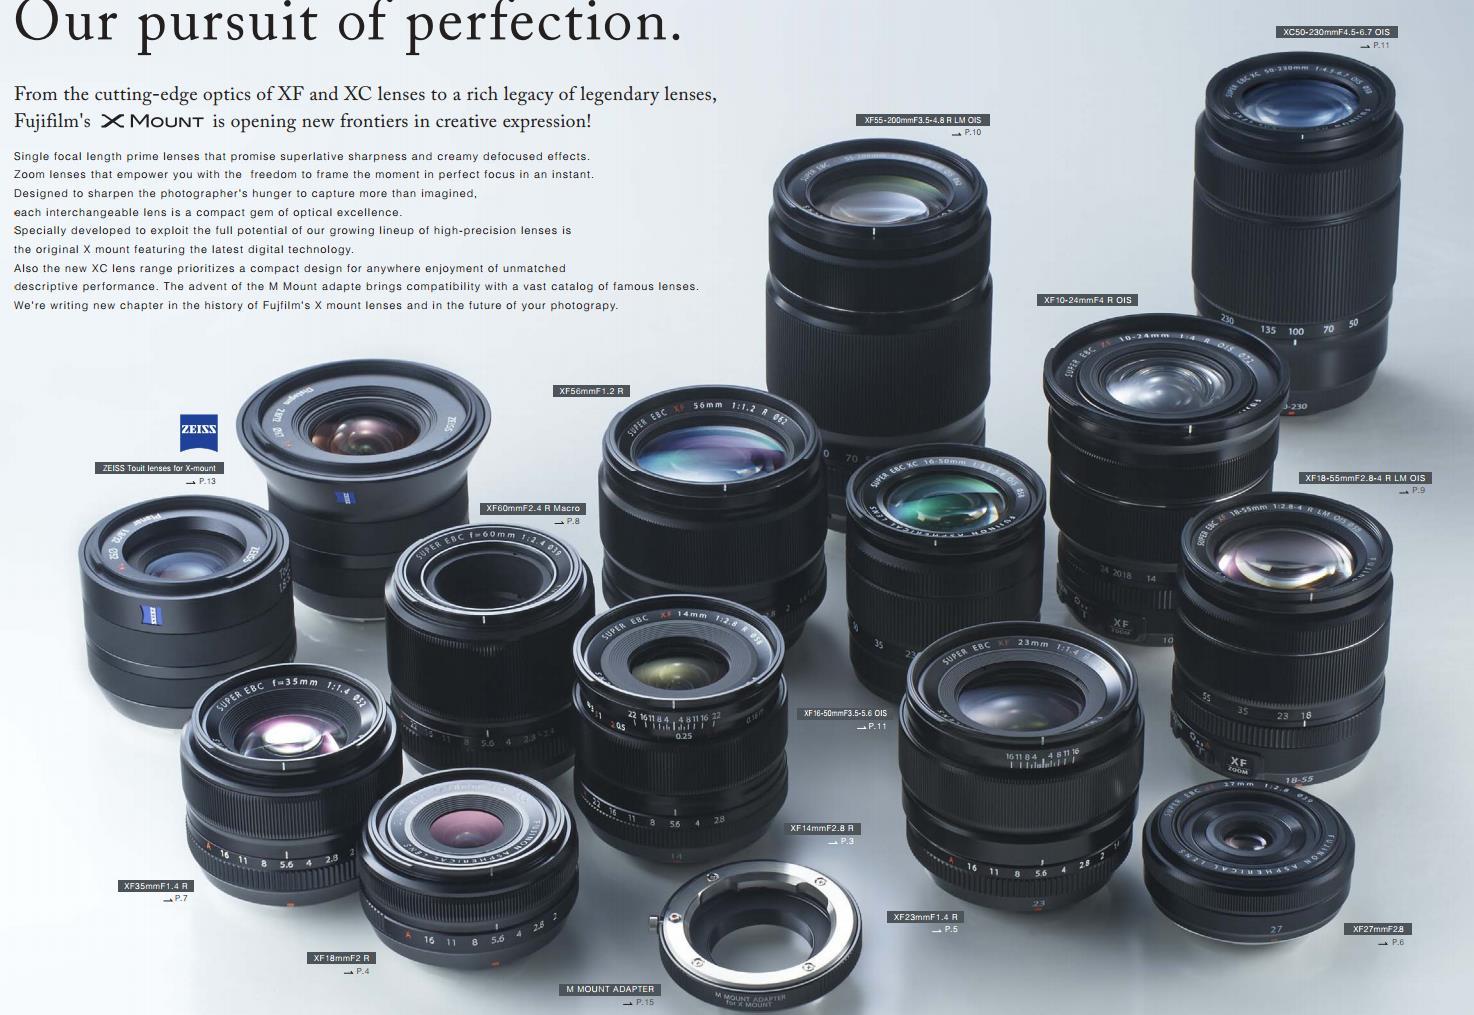 Fujifilm Xf 56mm F 12 R And 10 24mm 4 Lenses Image Leaked Fujinon Xf56mm X Lens Series